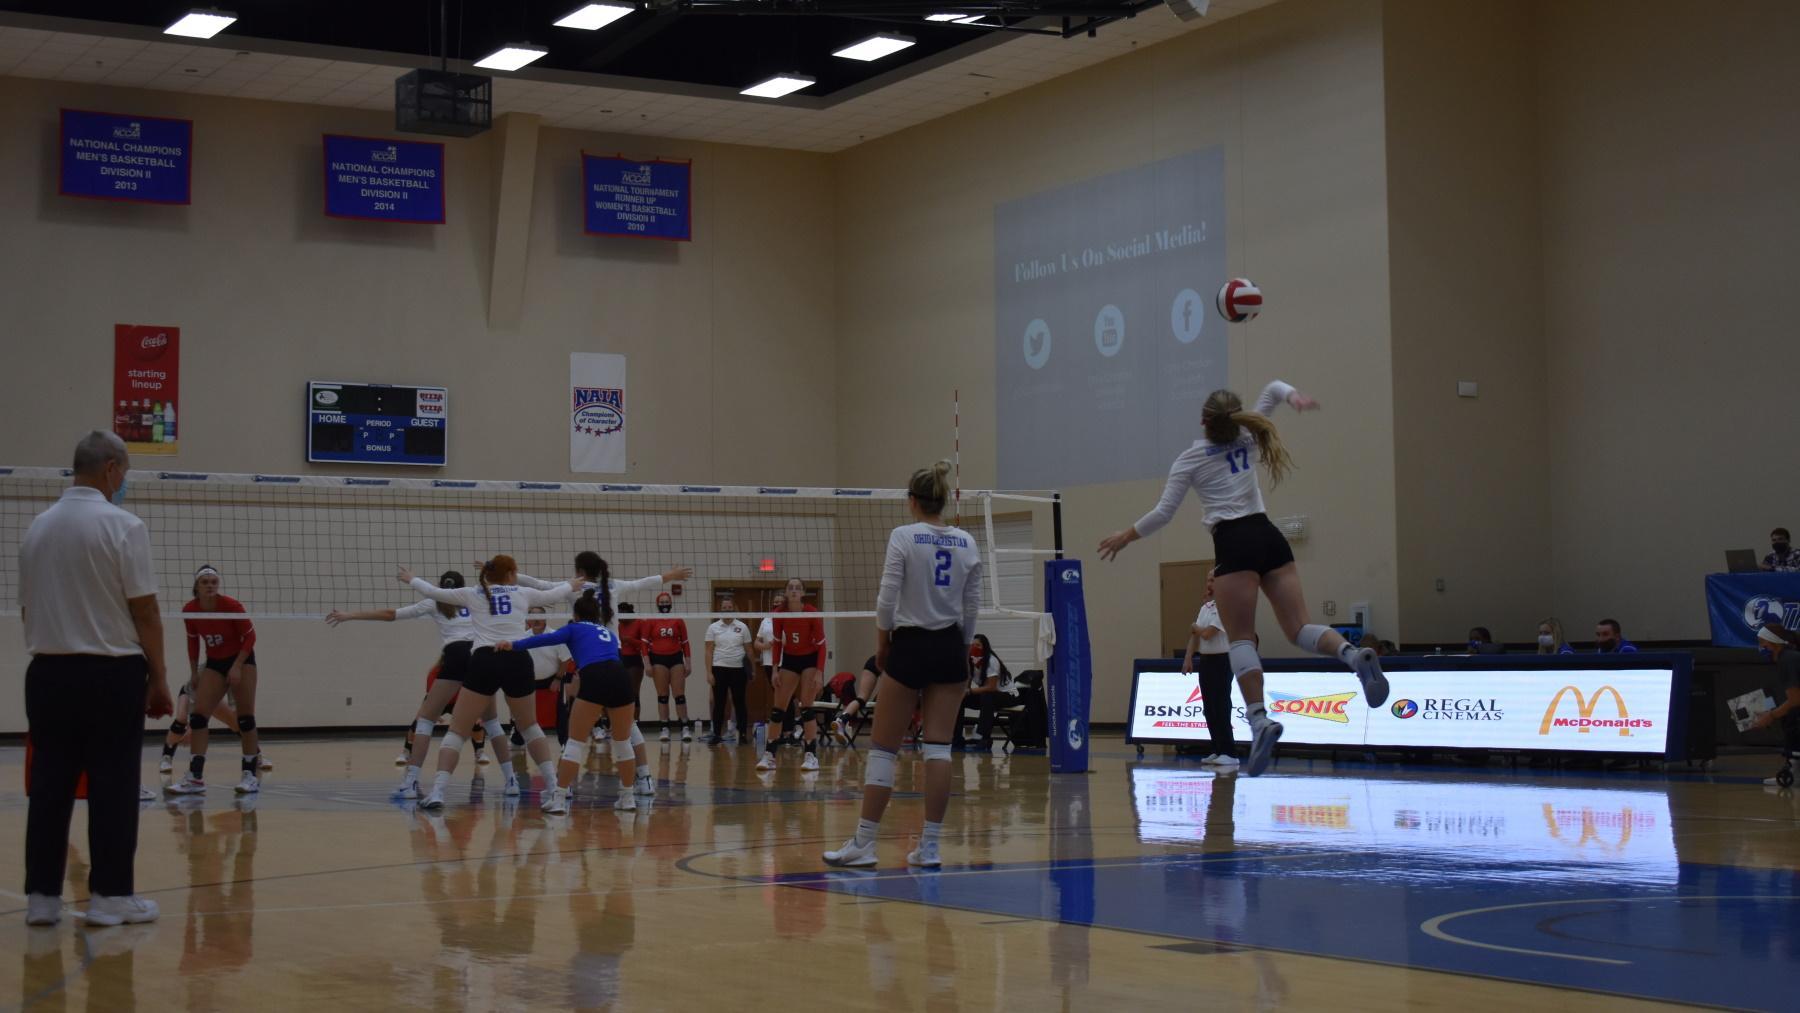 2020 Volleyball Ohio Christian University Athletics